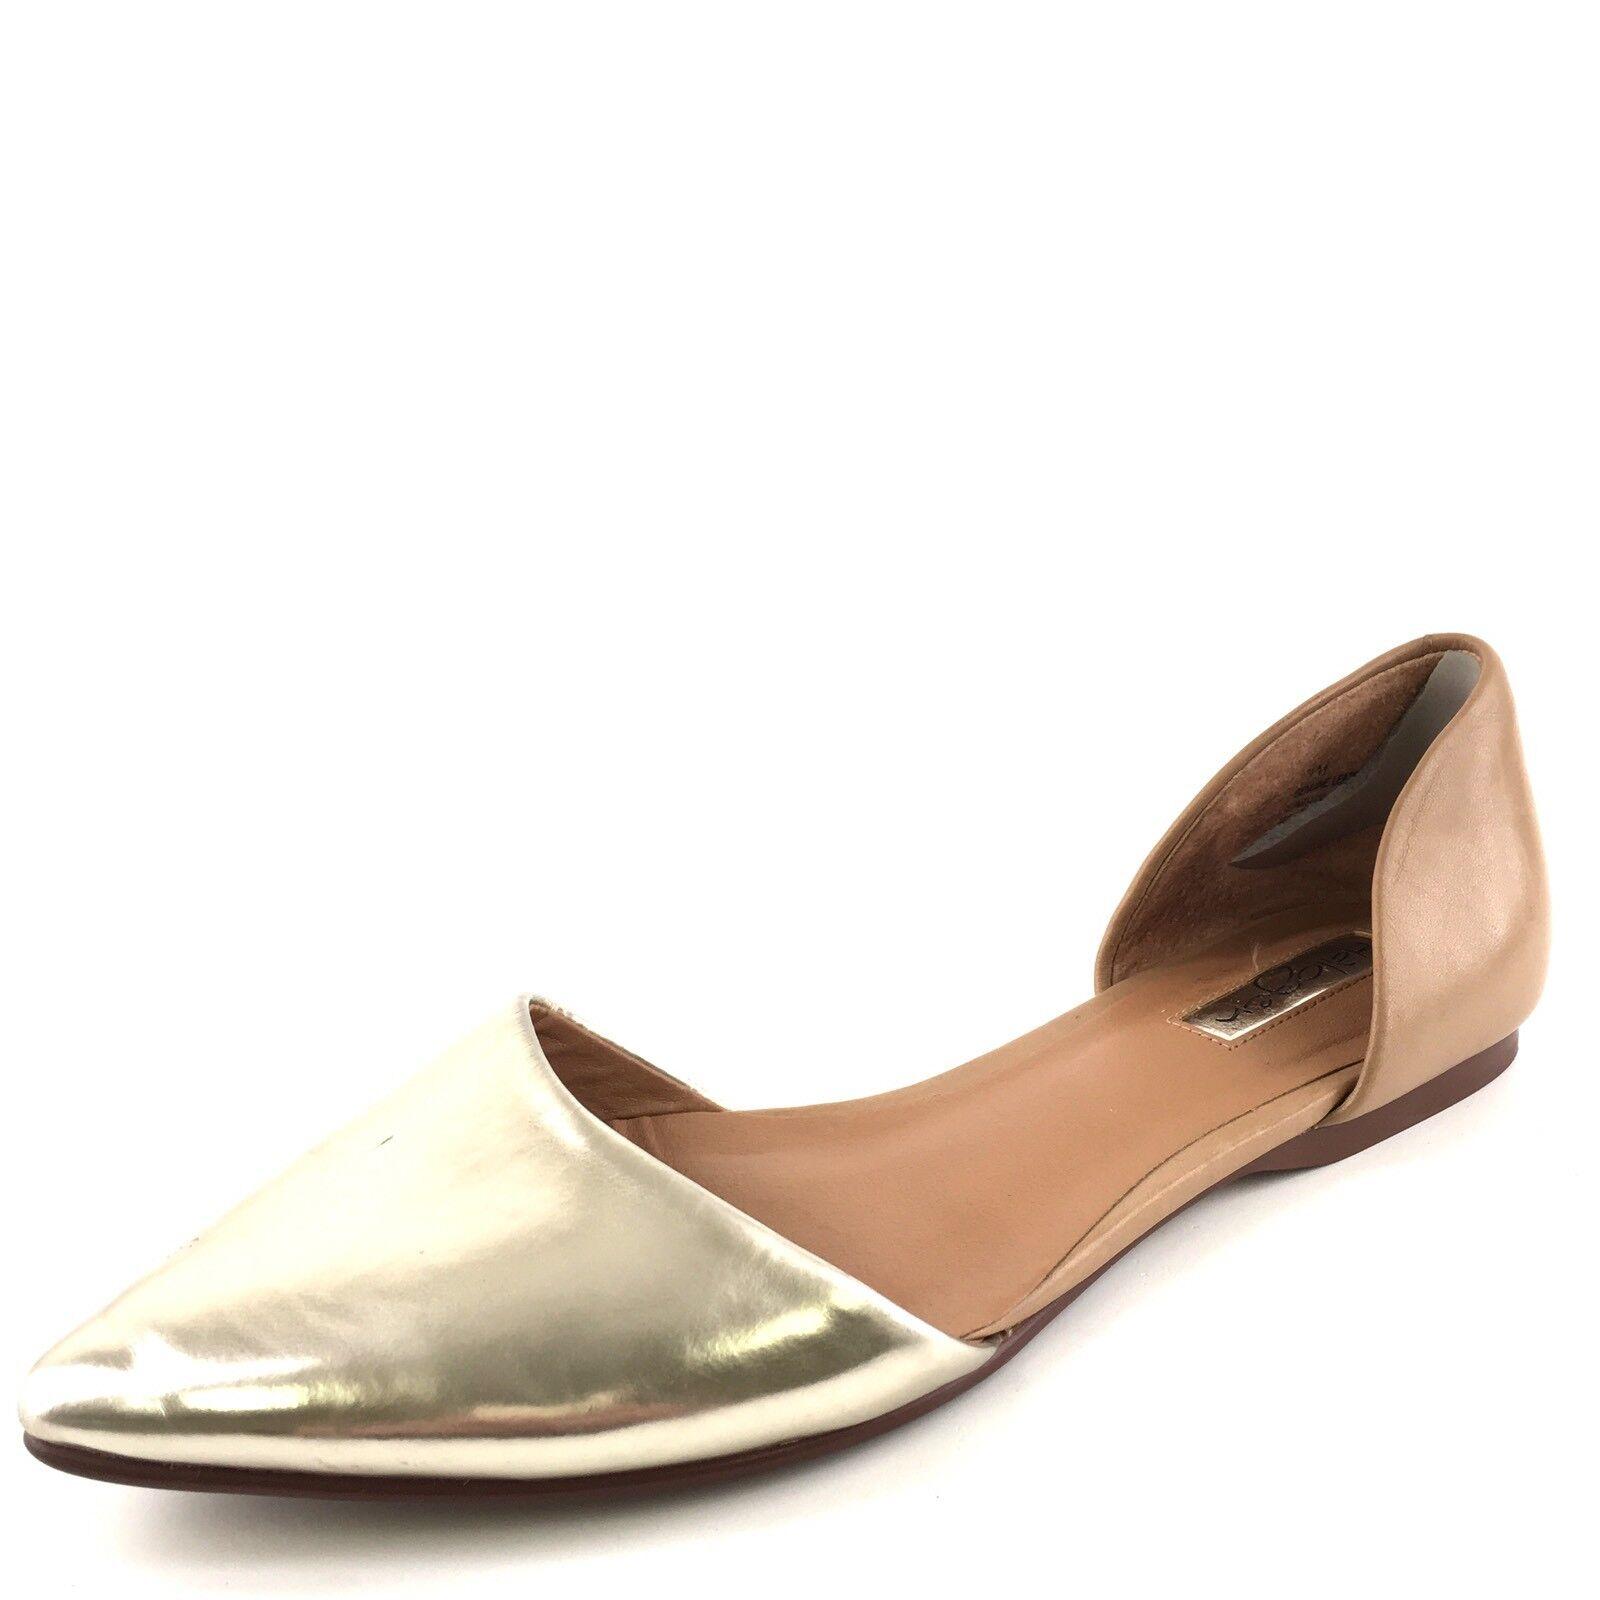 Halogen Kayla D'Orsay gold Tan Leather Flats Women's Size 7.5 M